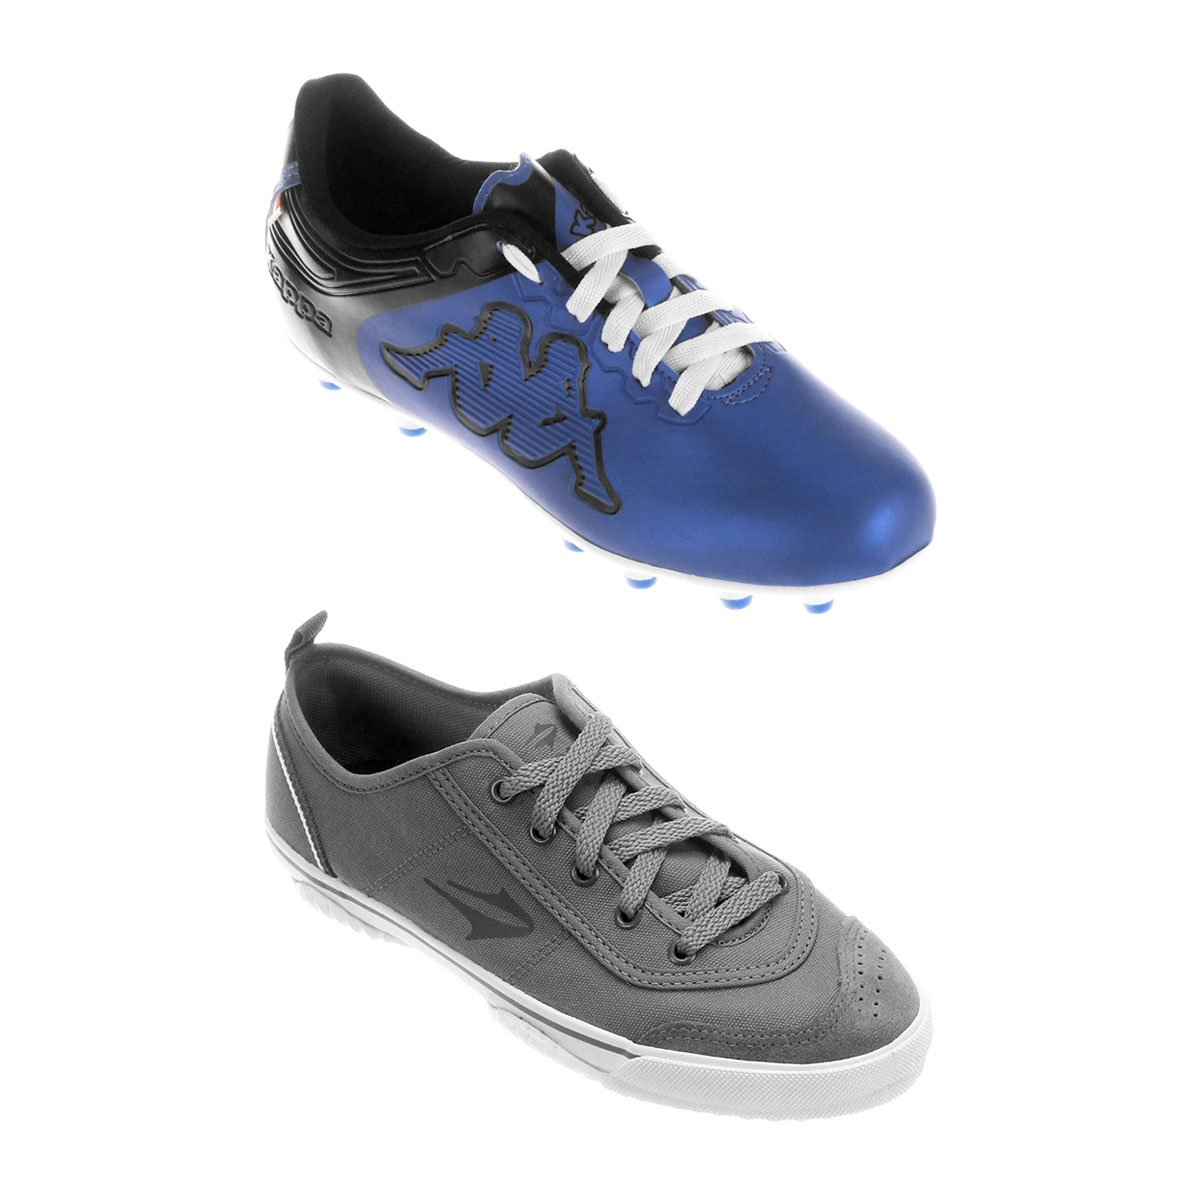 d3b642a7ae6 Kit Chuteira Kappa Fuerza Campo + Chuteira Topper New Casual 3 Futsal -  Compre Agora